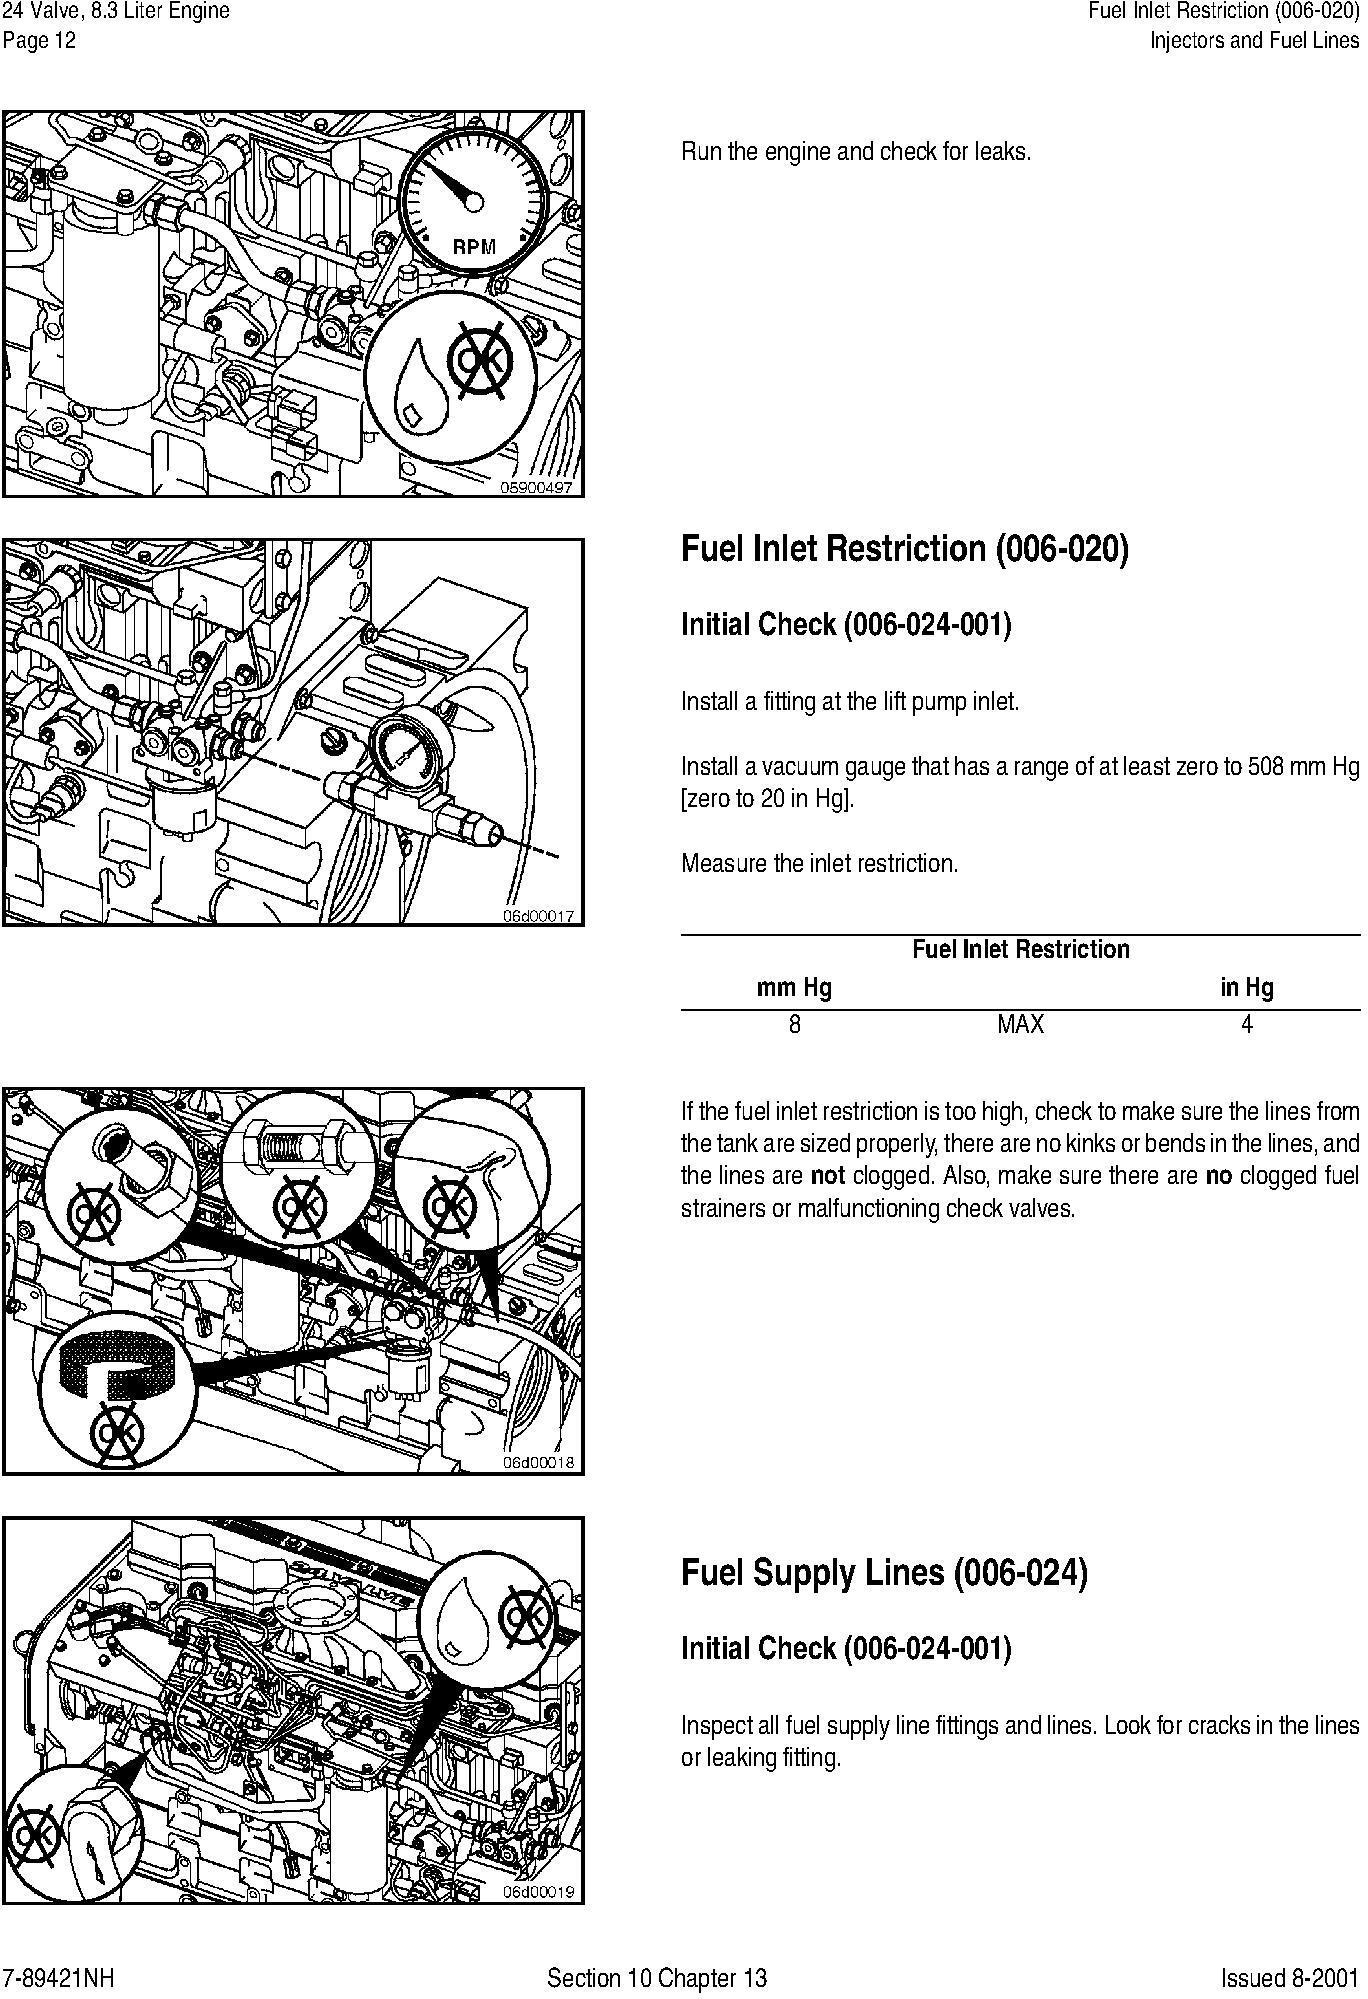 New Holland TJ275, TJ325, TJ375, TJ425, TJ450, TJ500 Tractors Complete Service Manual - 2